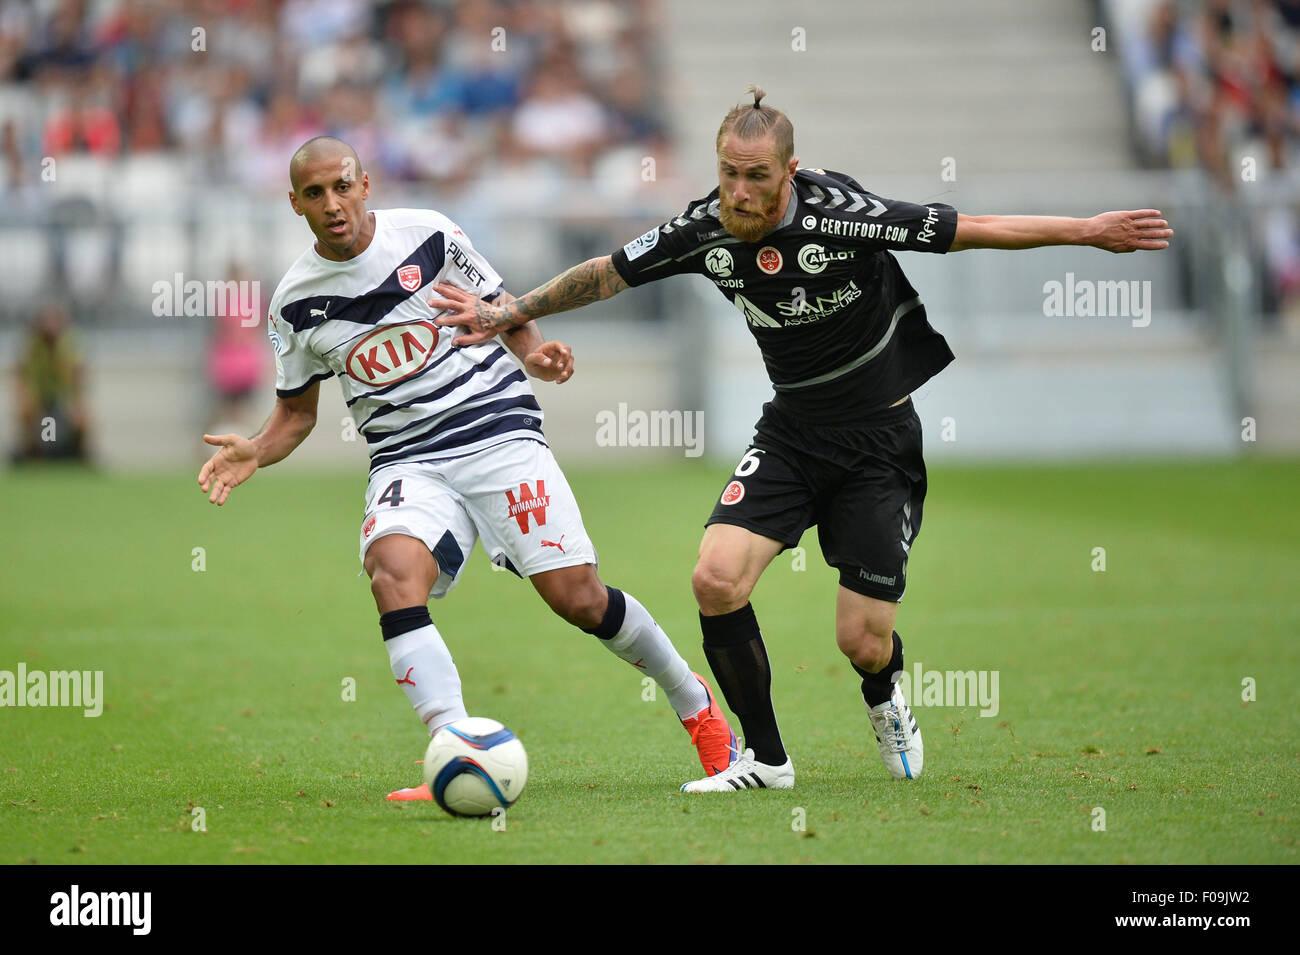 france 2 league